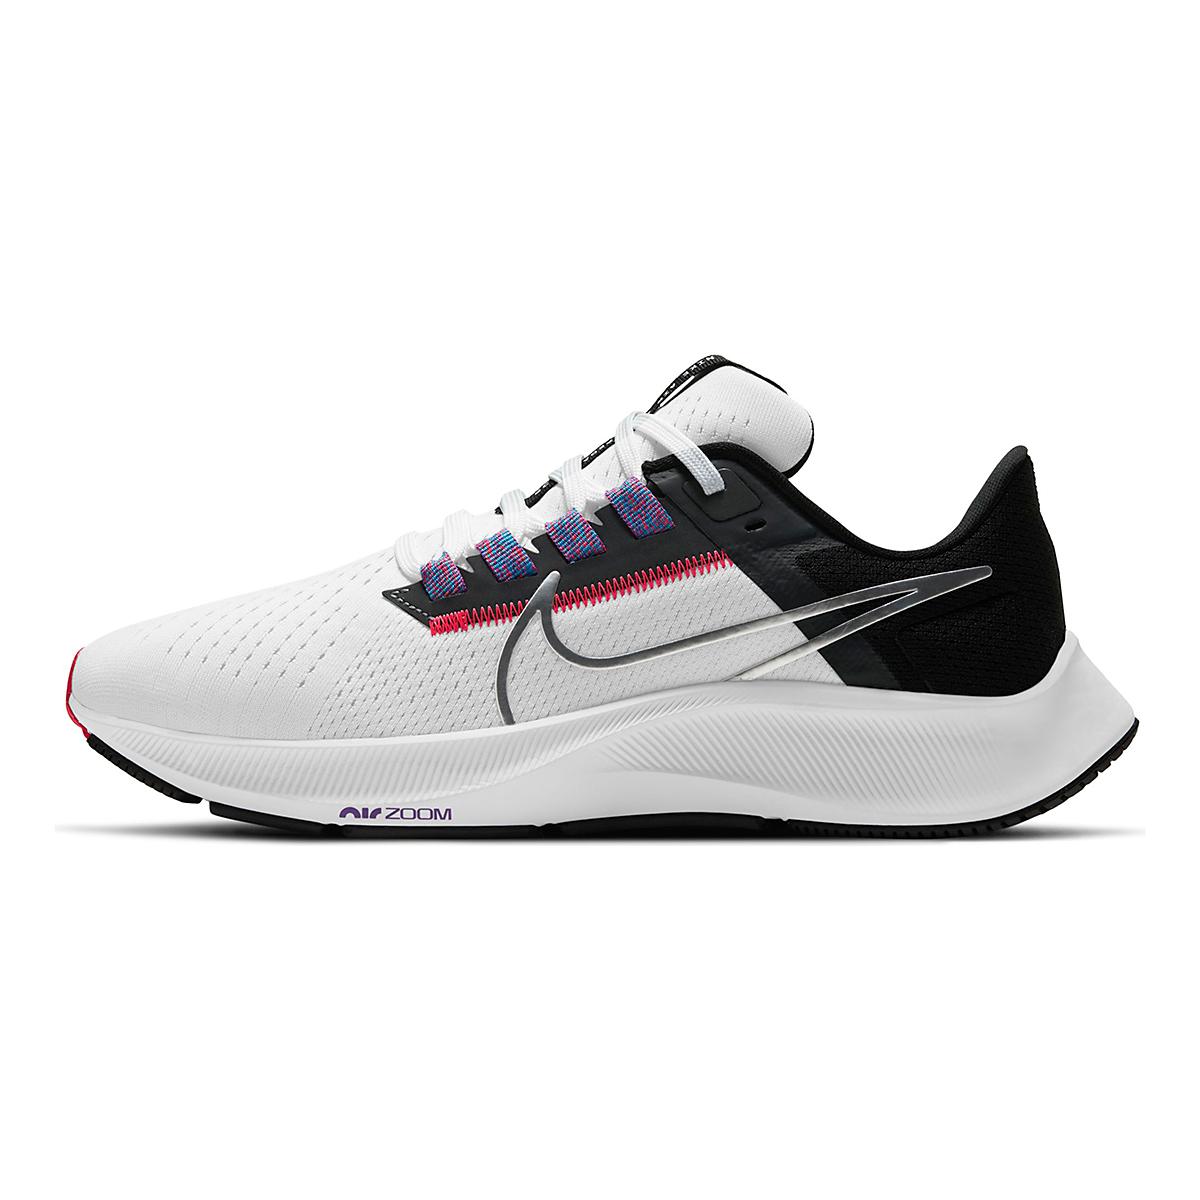 Women's Nike Air Zoom Pegasus 38 Running Shoe - Color: White/Metallic Silver/Black - Size: 5 - Width: Regular, White/Metallic Silver/Black, large, image 2